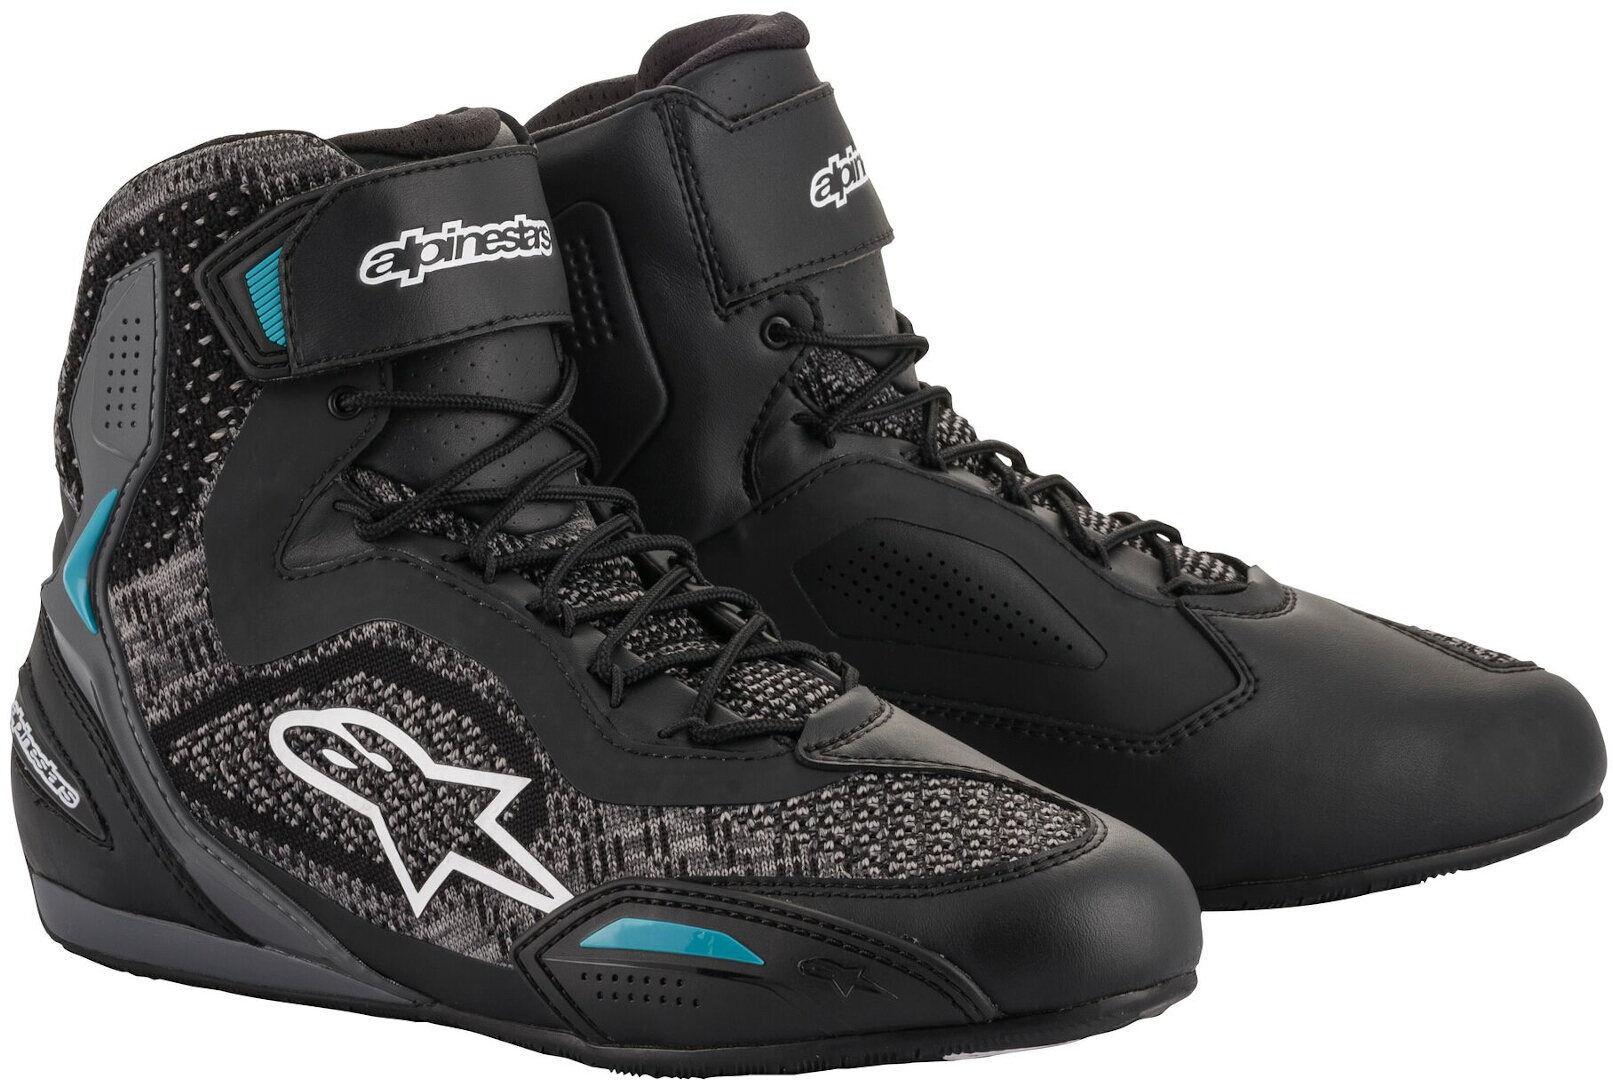 Alpinestars Stella Faster-3 Rideknit Ladies Motorcycle Shoes Black White Blue 44